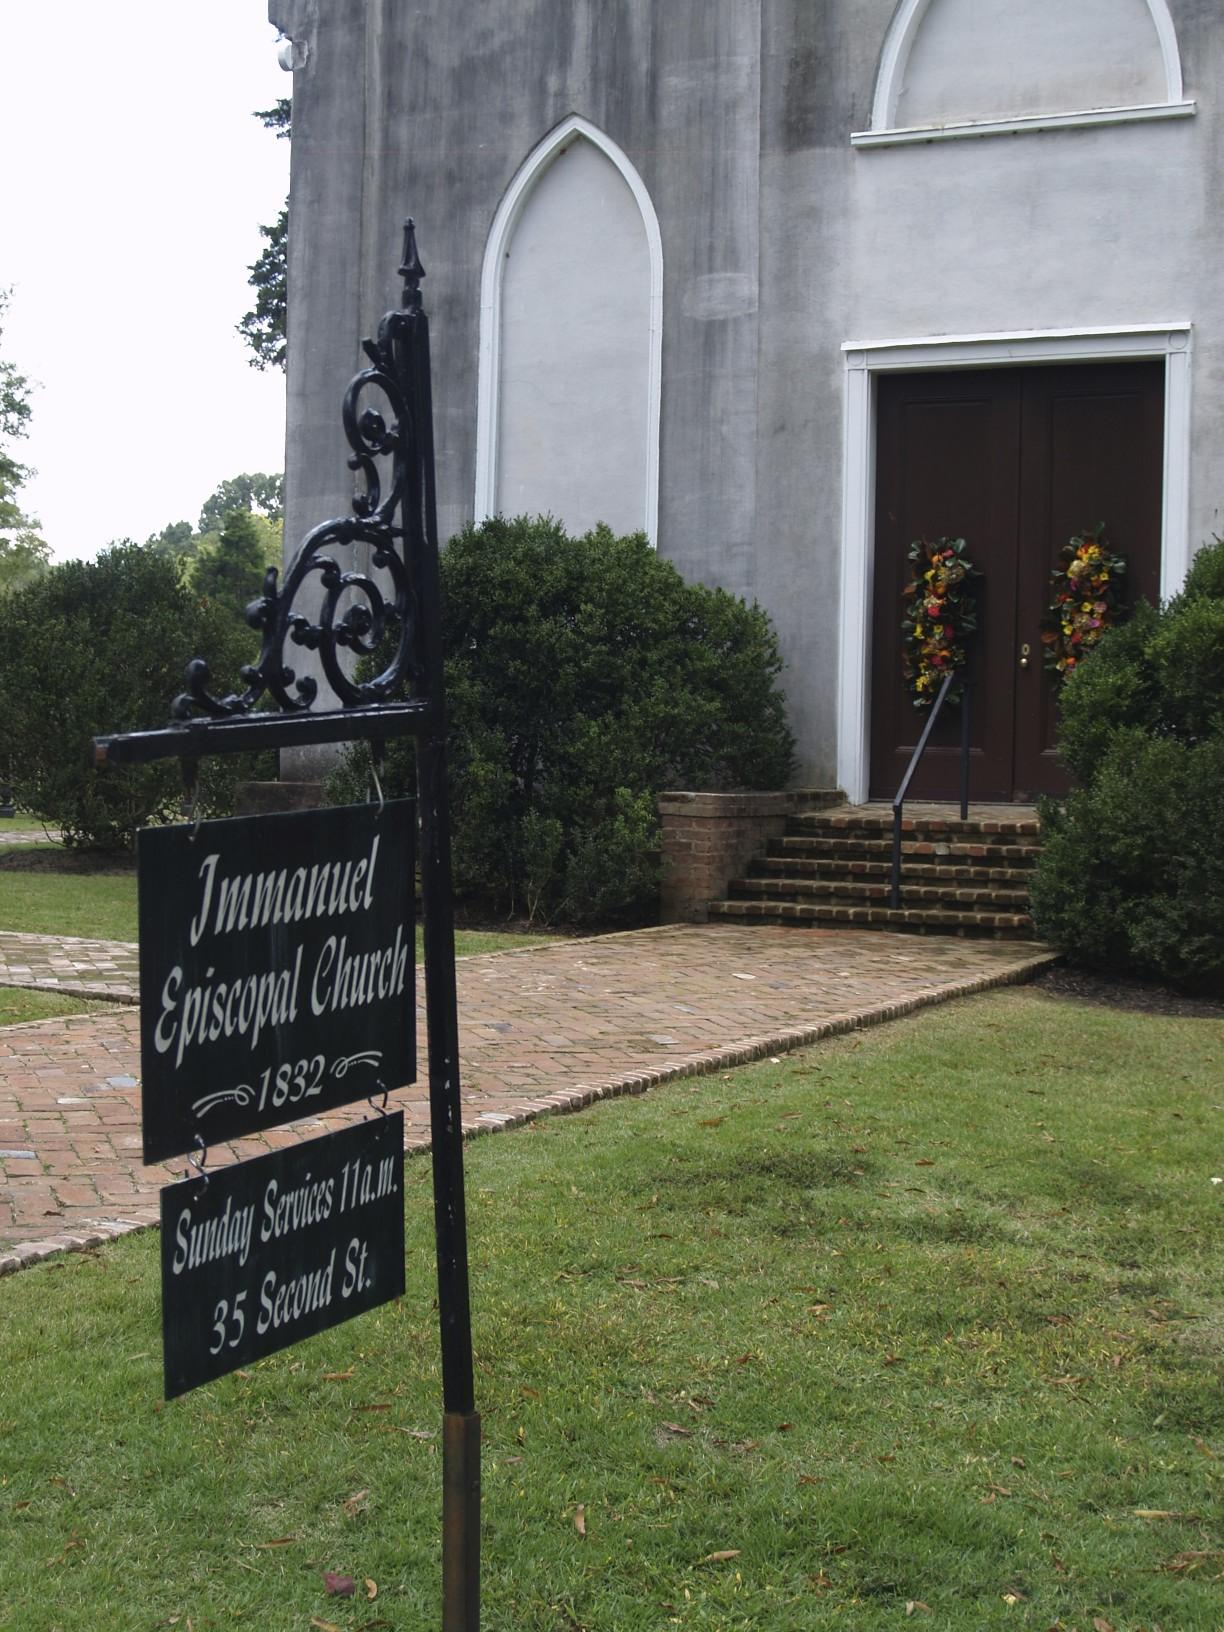 Immanuel Espiscopal Church